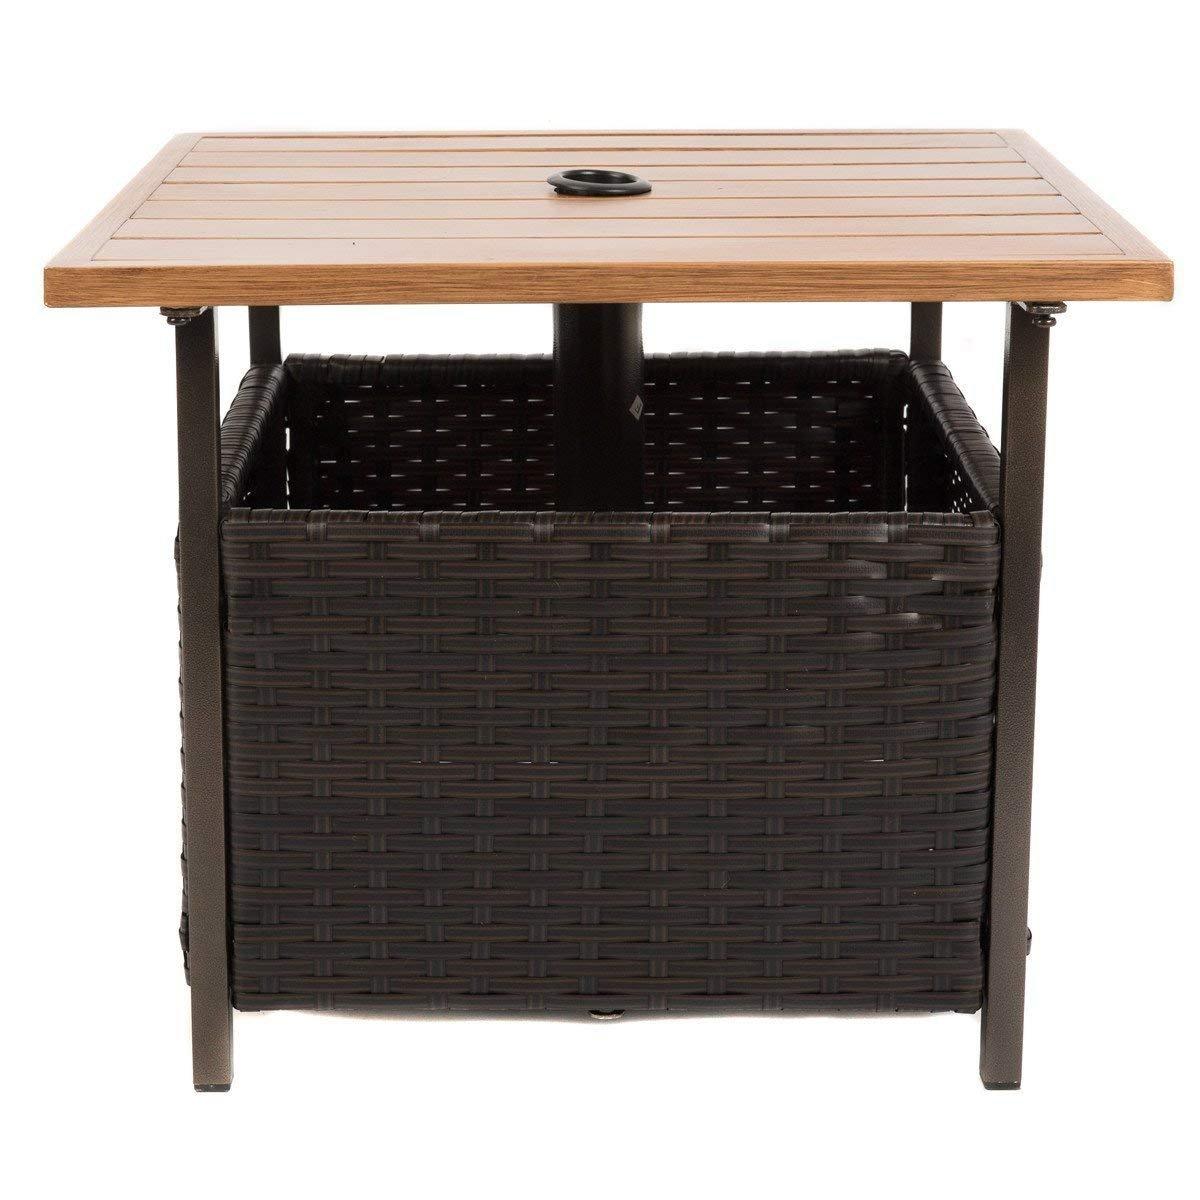 Naturefun Outdoor PE Wicker Square Bistro Side Table, Garden Leisure Coffee Table with Umbrella Hole